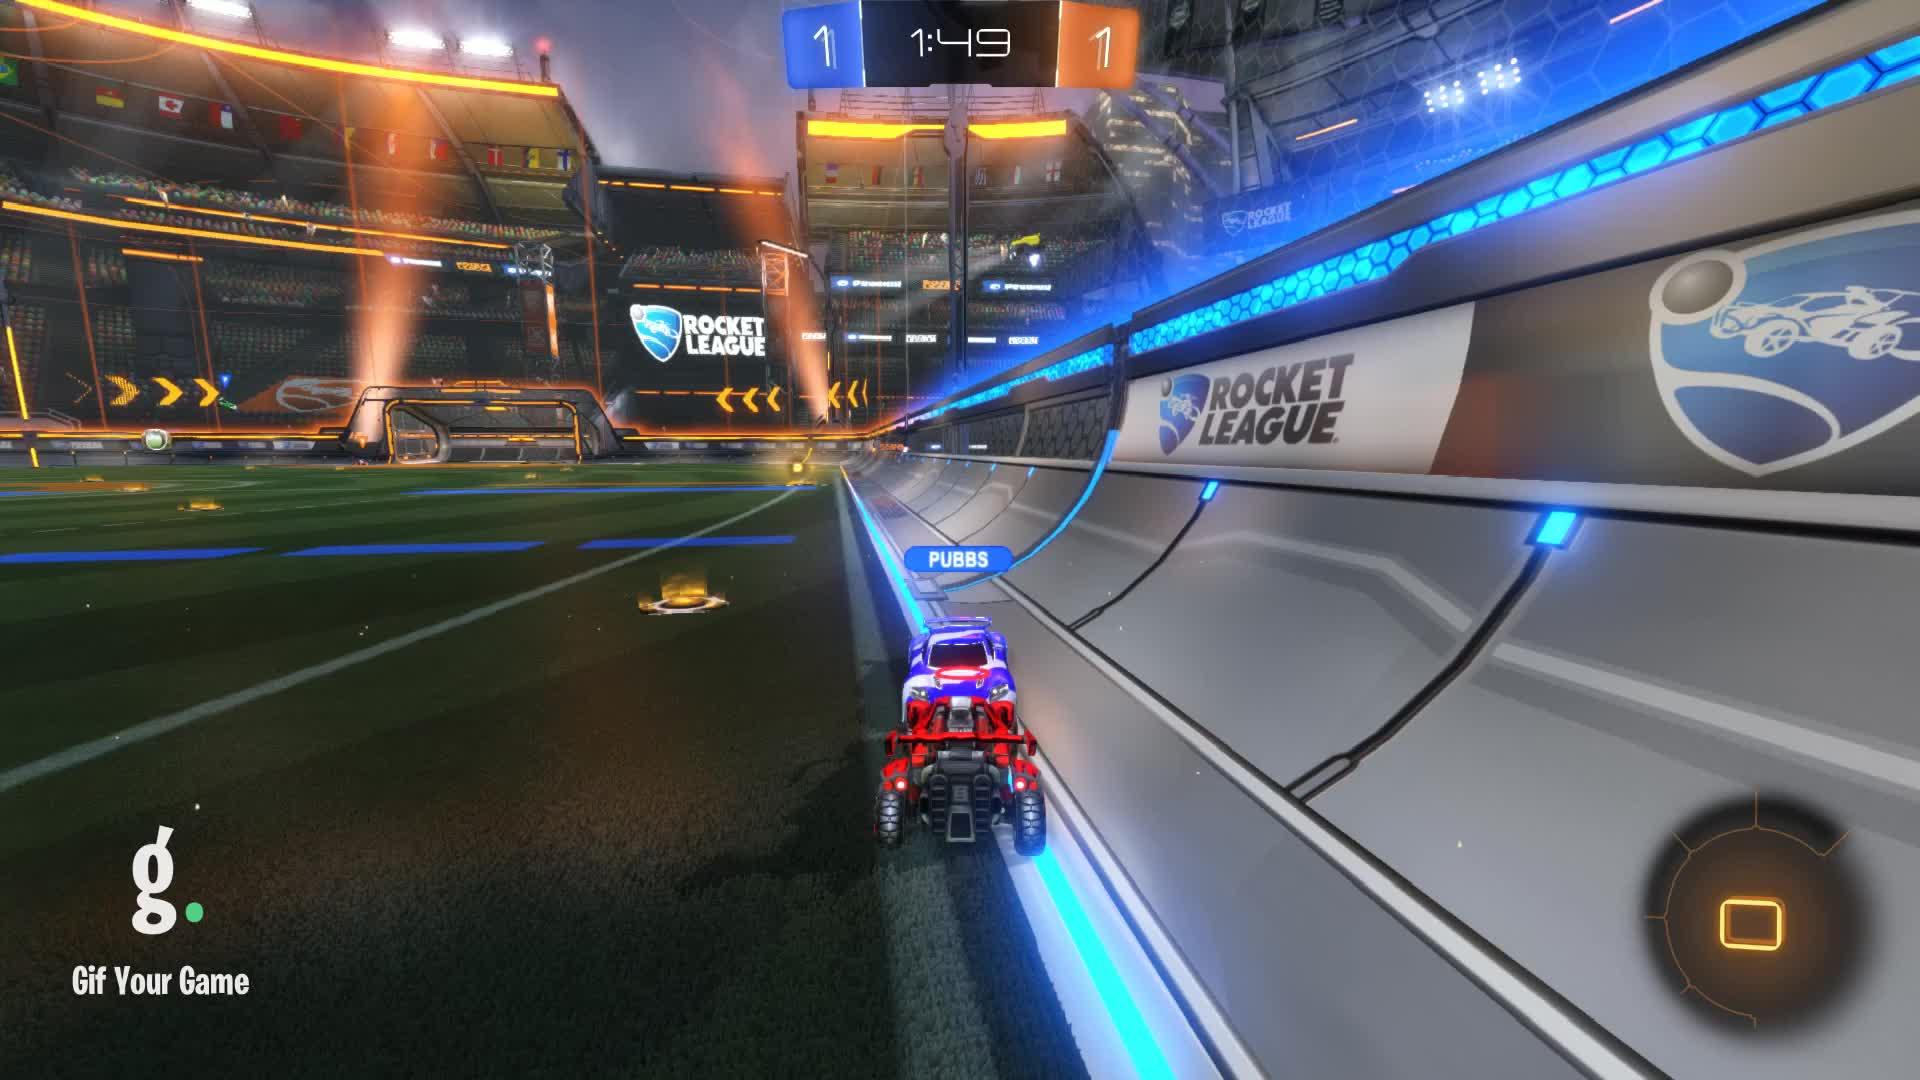 Gif Your Game, GifYourGame, Goal, Rocket League, RocketLeague, Yung Vince, Goal 3: Acrypse GIFs